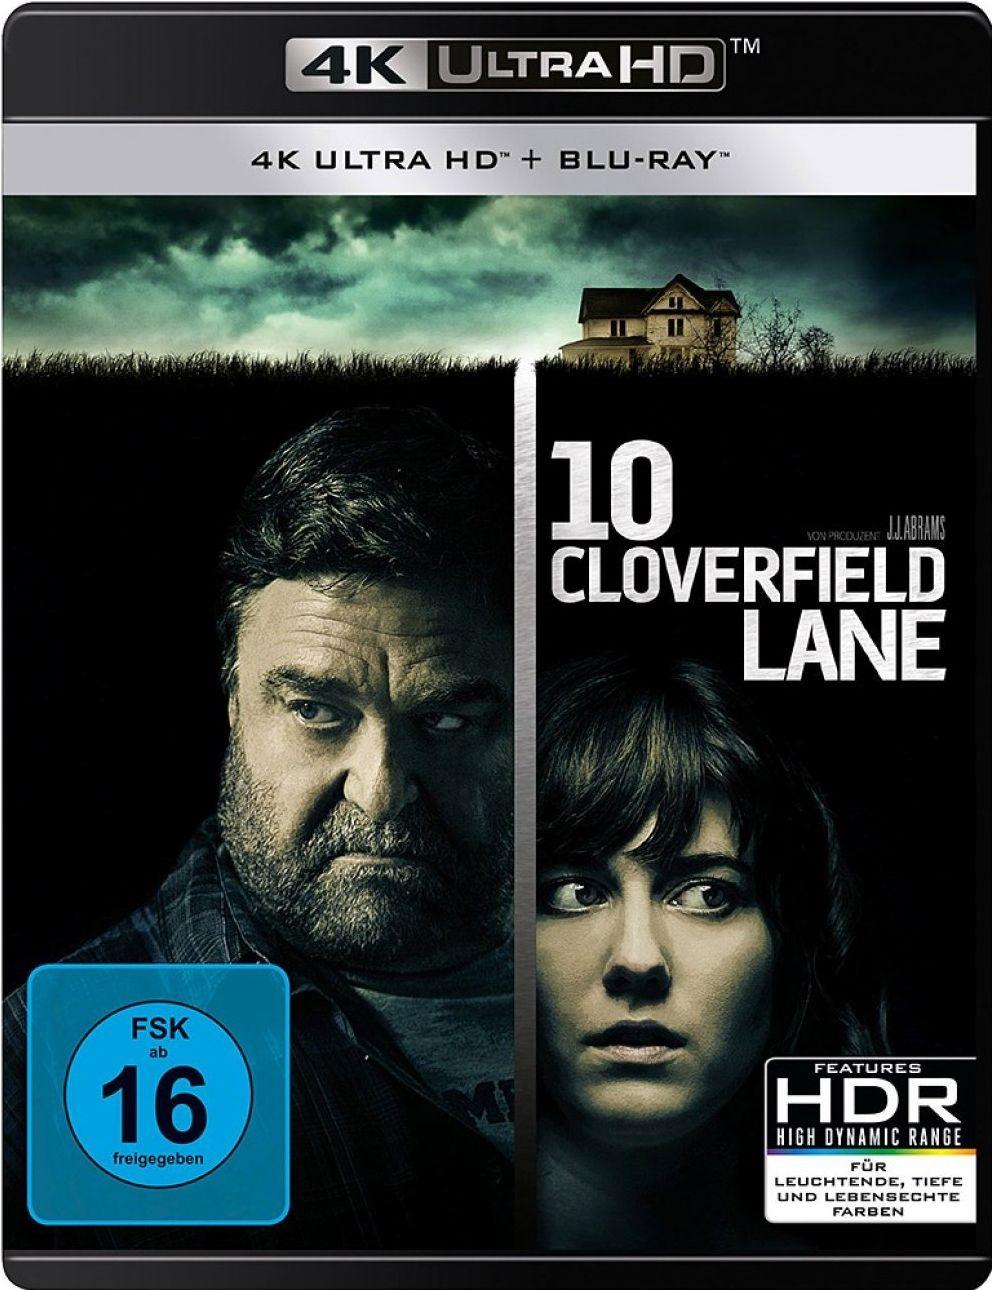 10 Cloverfield Lane (2 Discs) (UHD BLURAY + BLURAY)